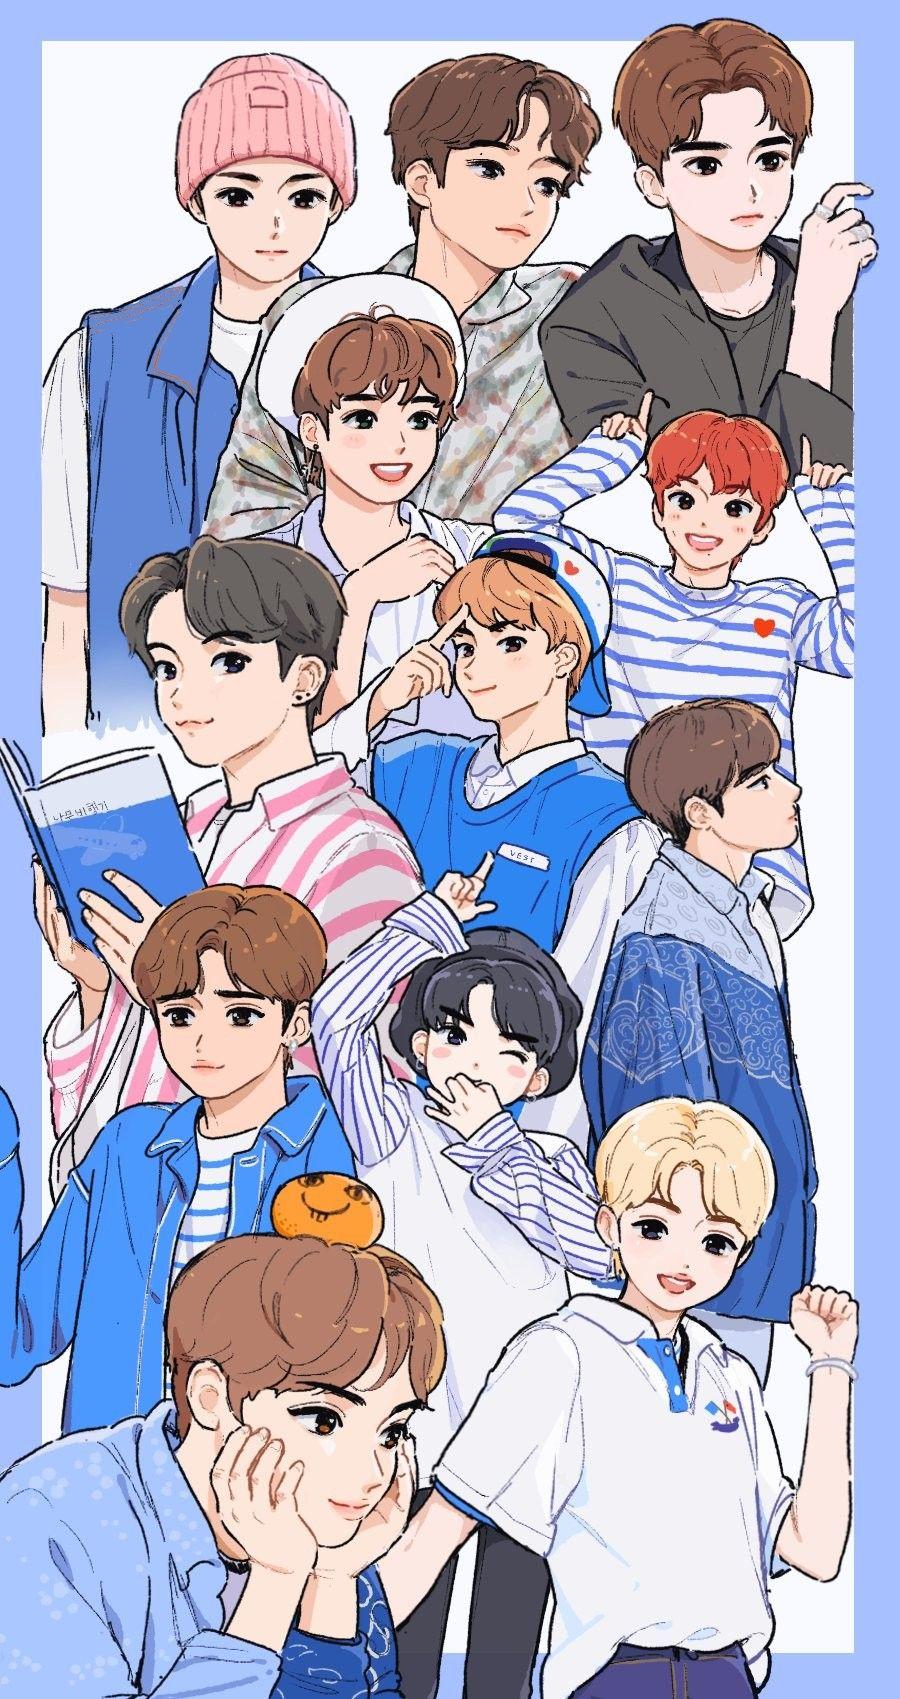 Pin By Crassula Jade On The Boyz In 2019 Cute Drawings